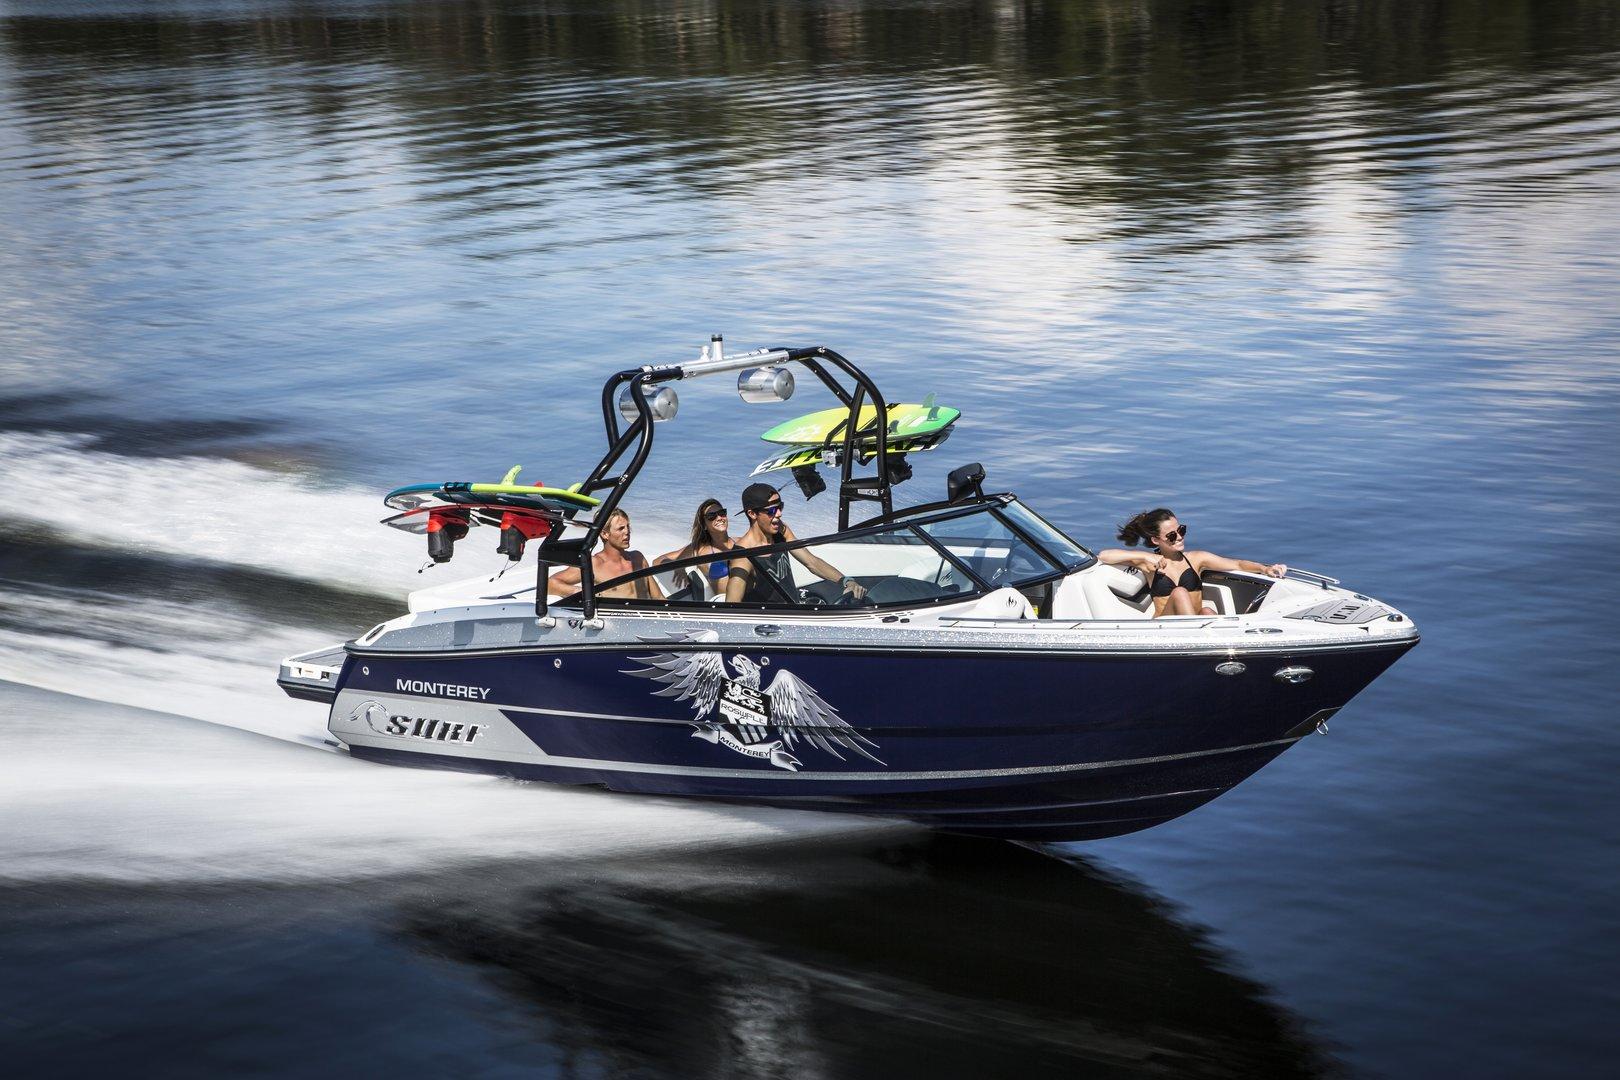 2019 Monterey 238ss Surf Loaded Sold Order You 2020